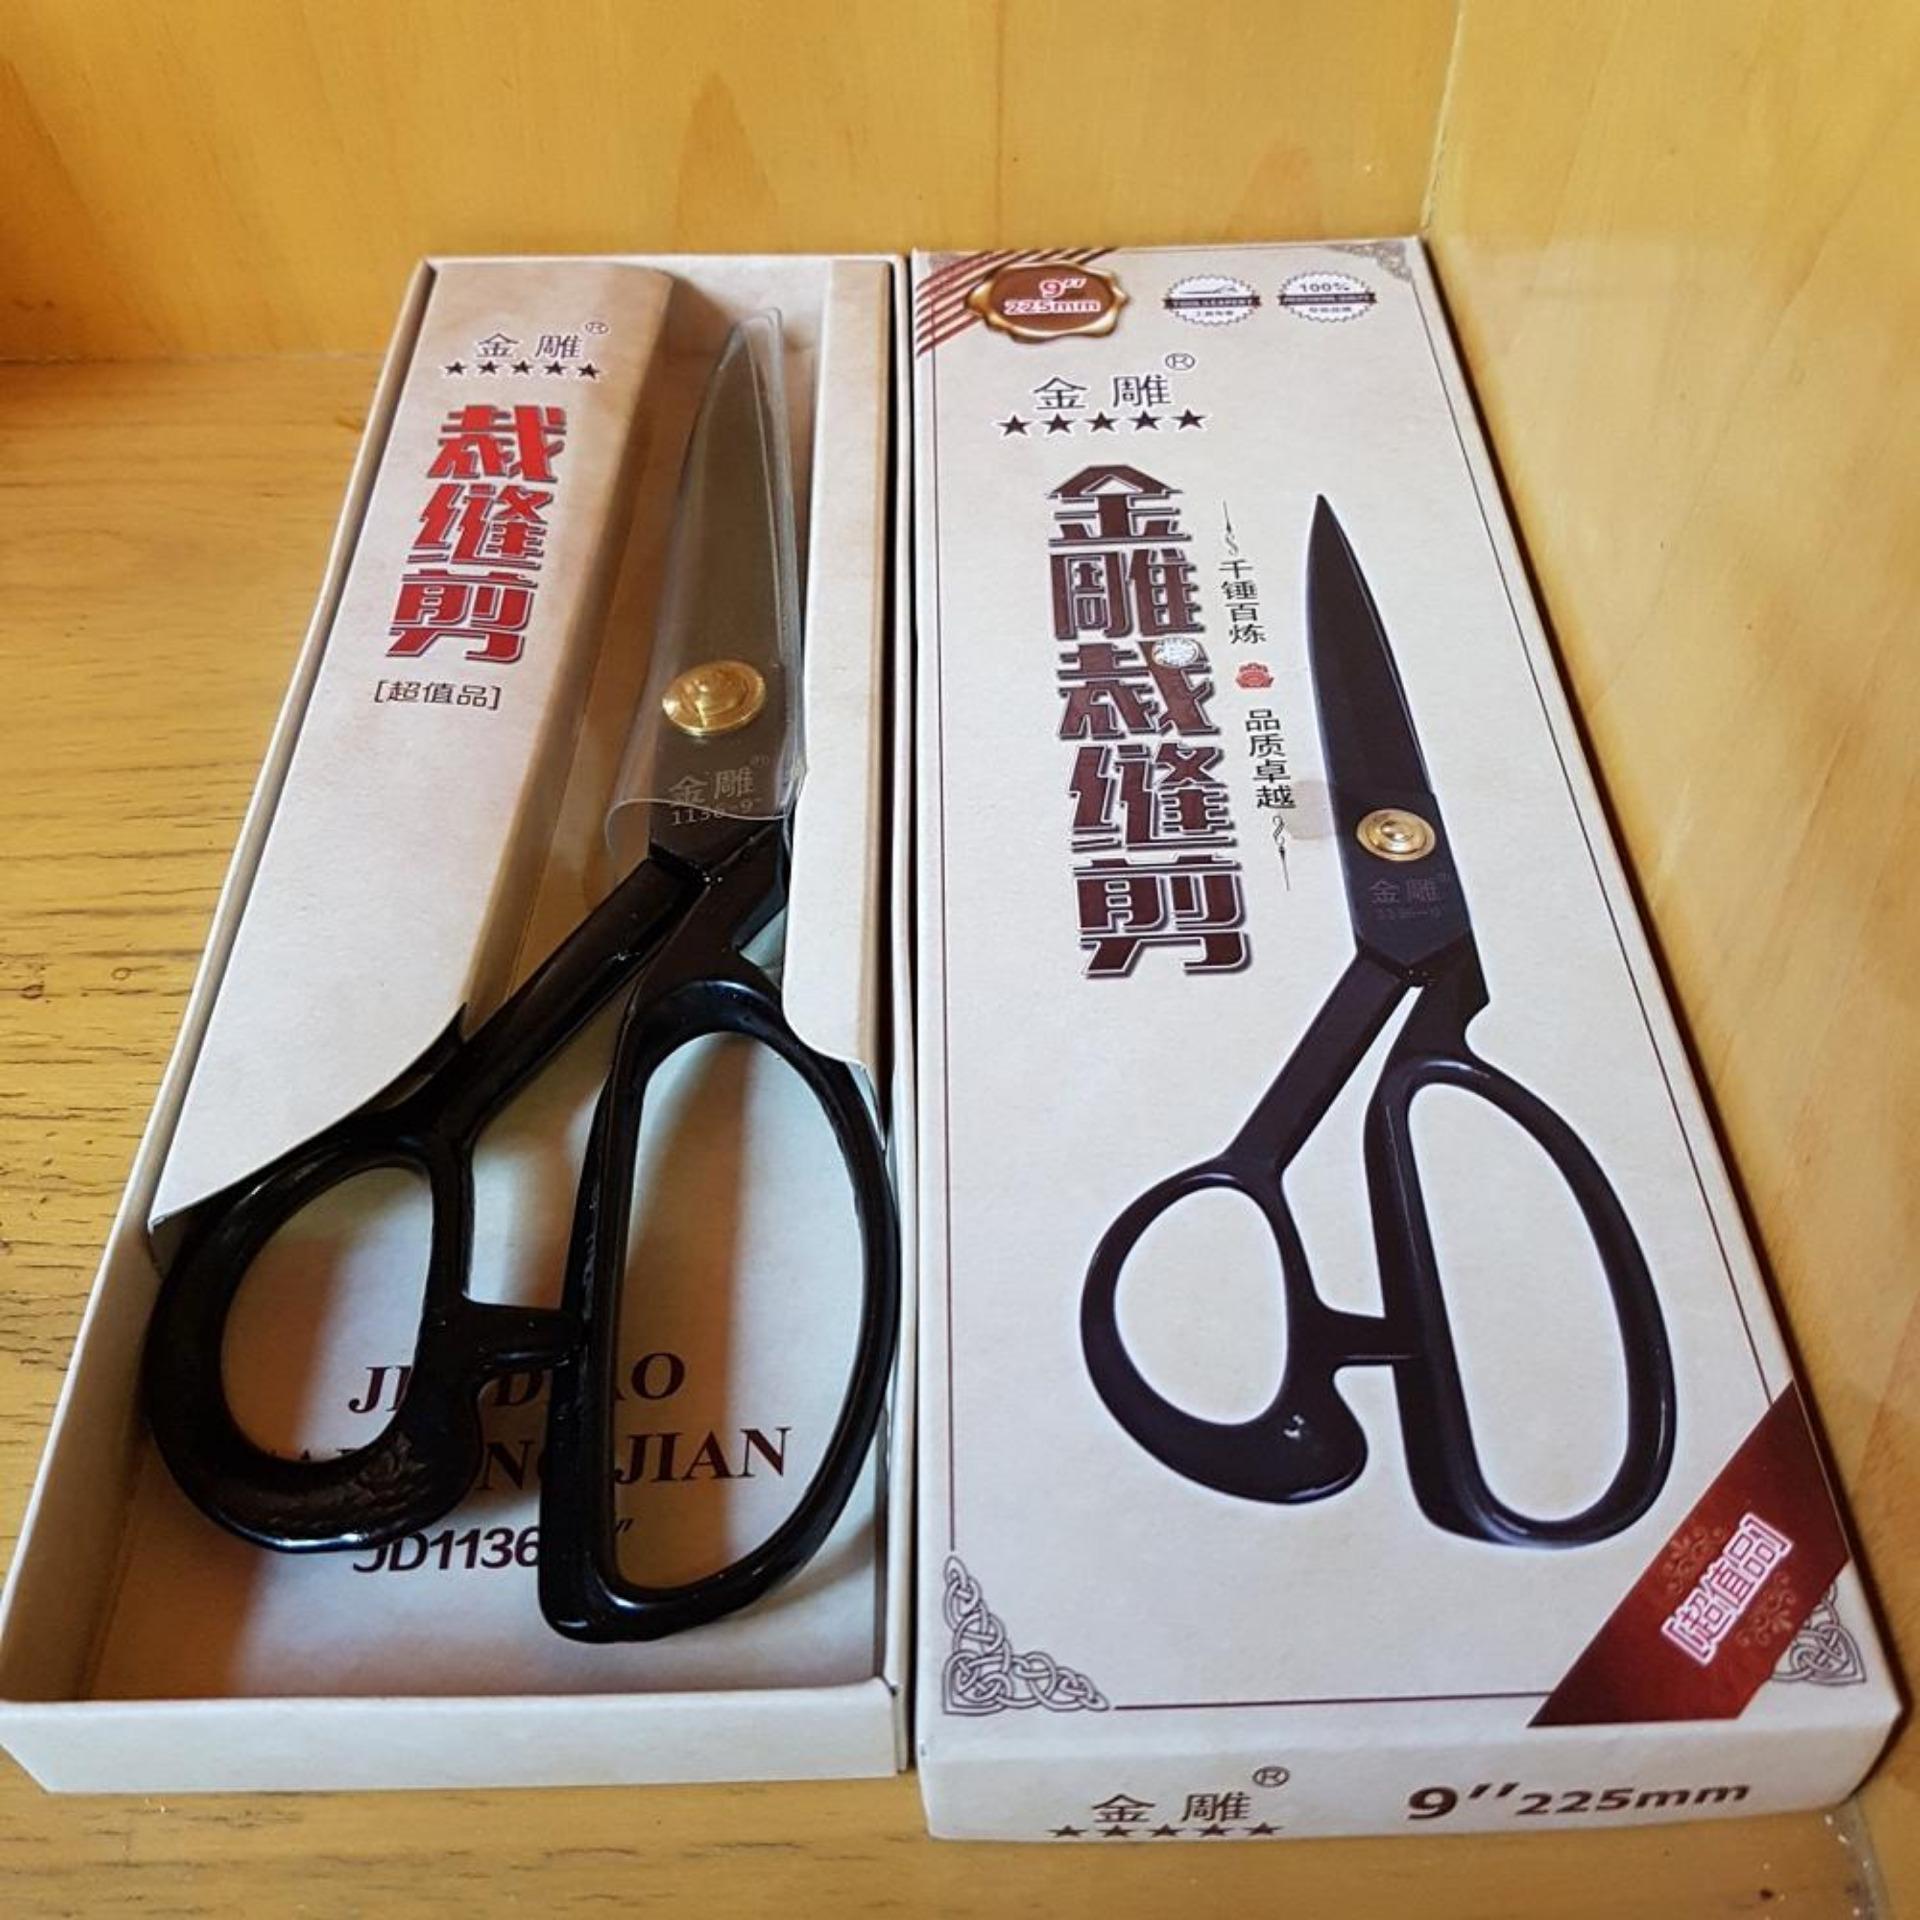 Harga Penawaran Jin Diao JD1136-9 Gunting Kain 9 inch - 225mm discount - Hanya Rp94.285